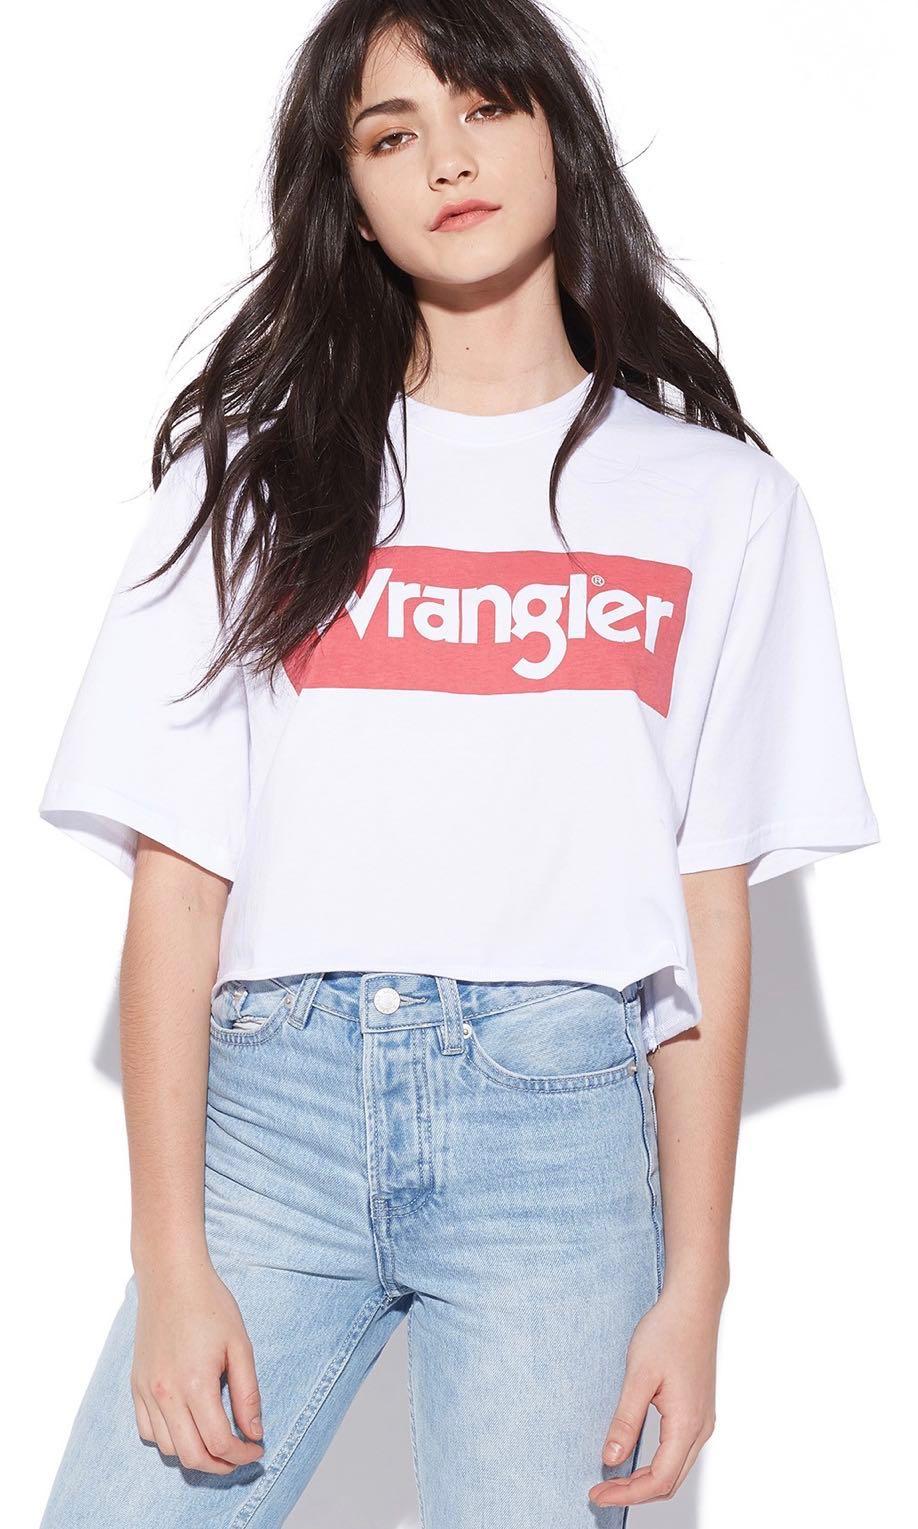 45f90f182c9 Wrangler boyfriend crop tee 6 white/navy, Women's Fashion, Clothes ...